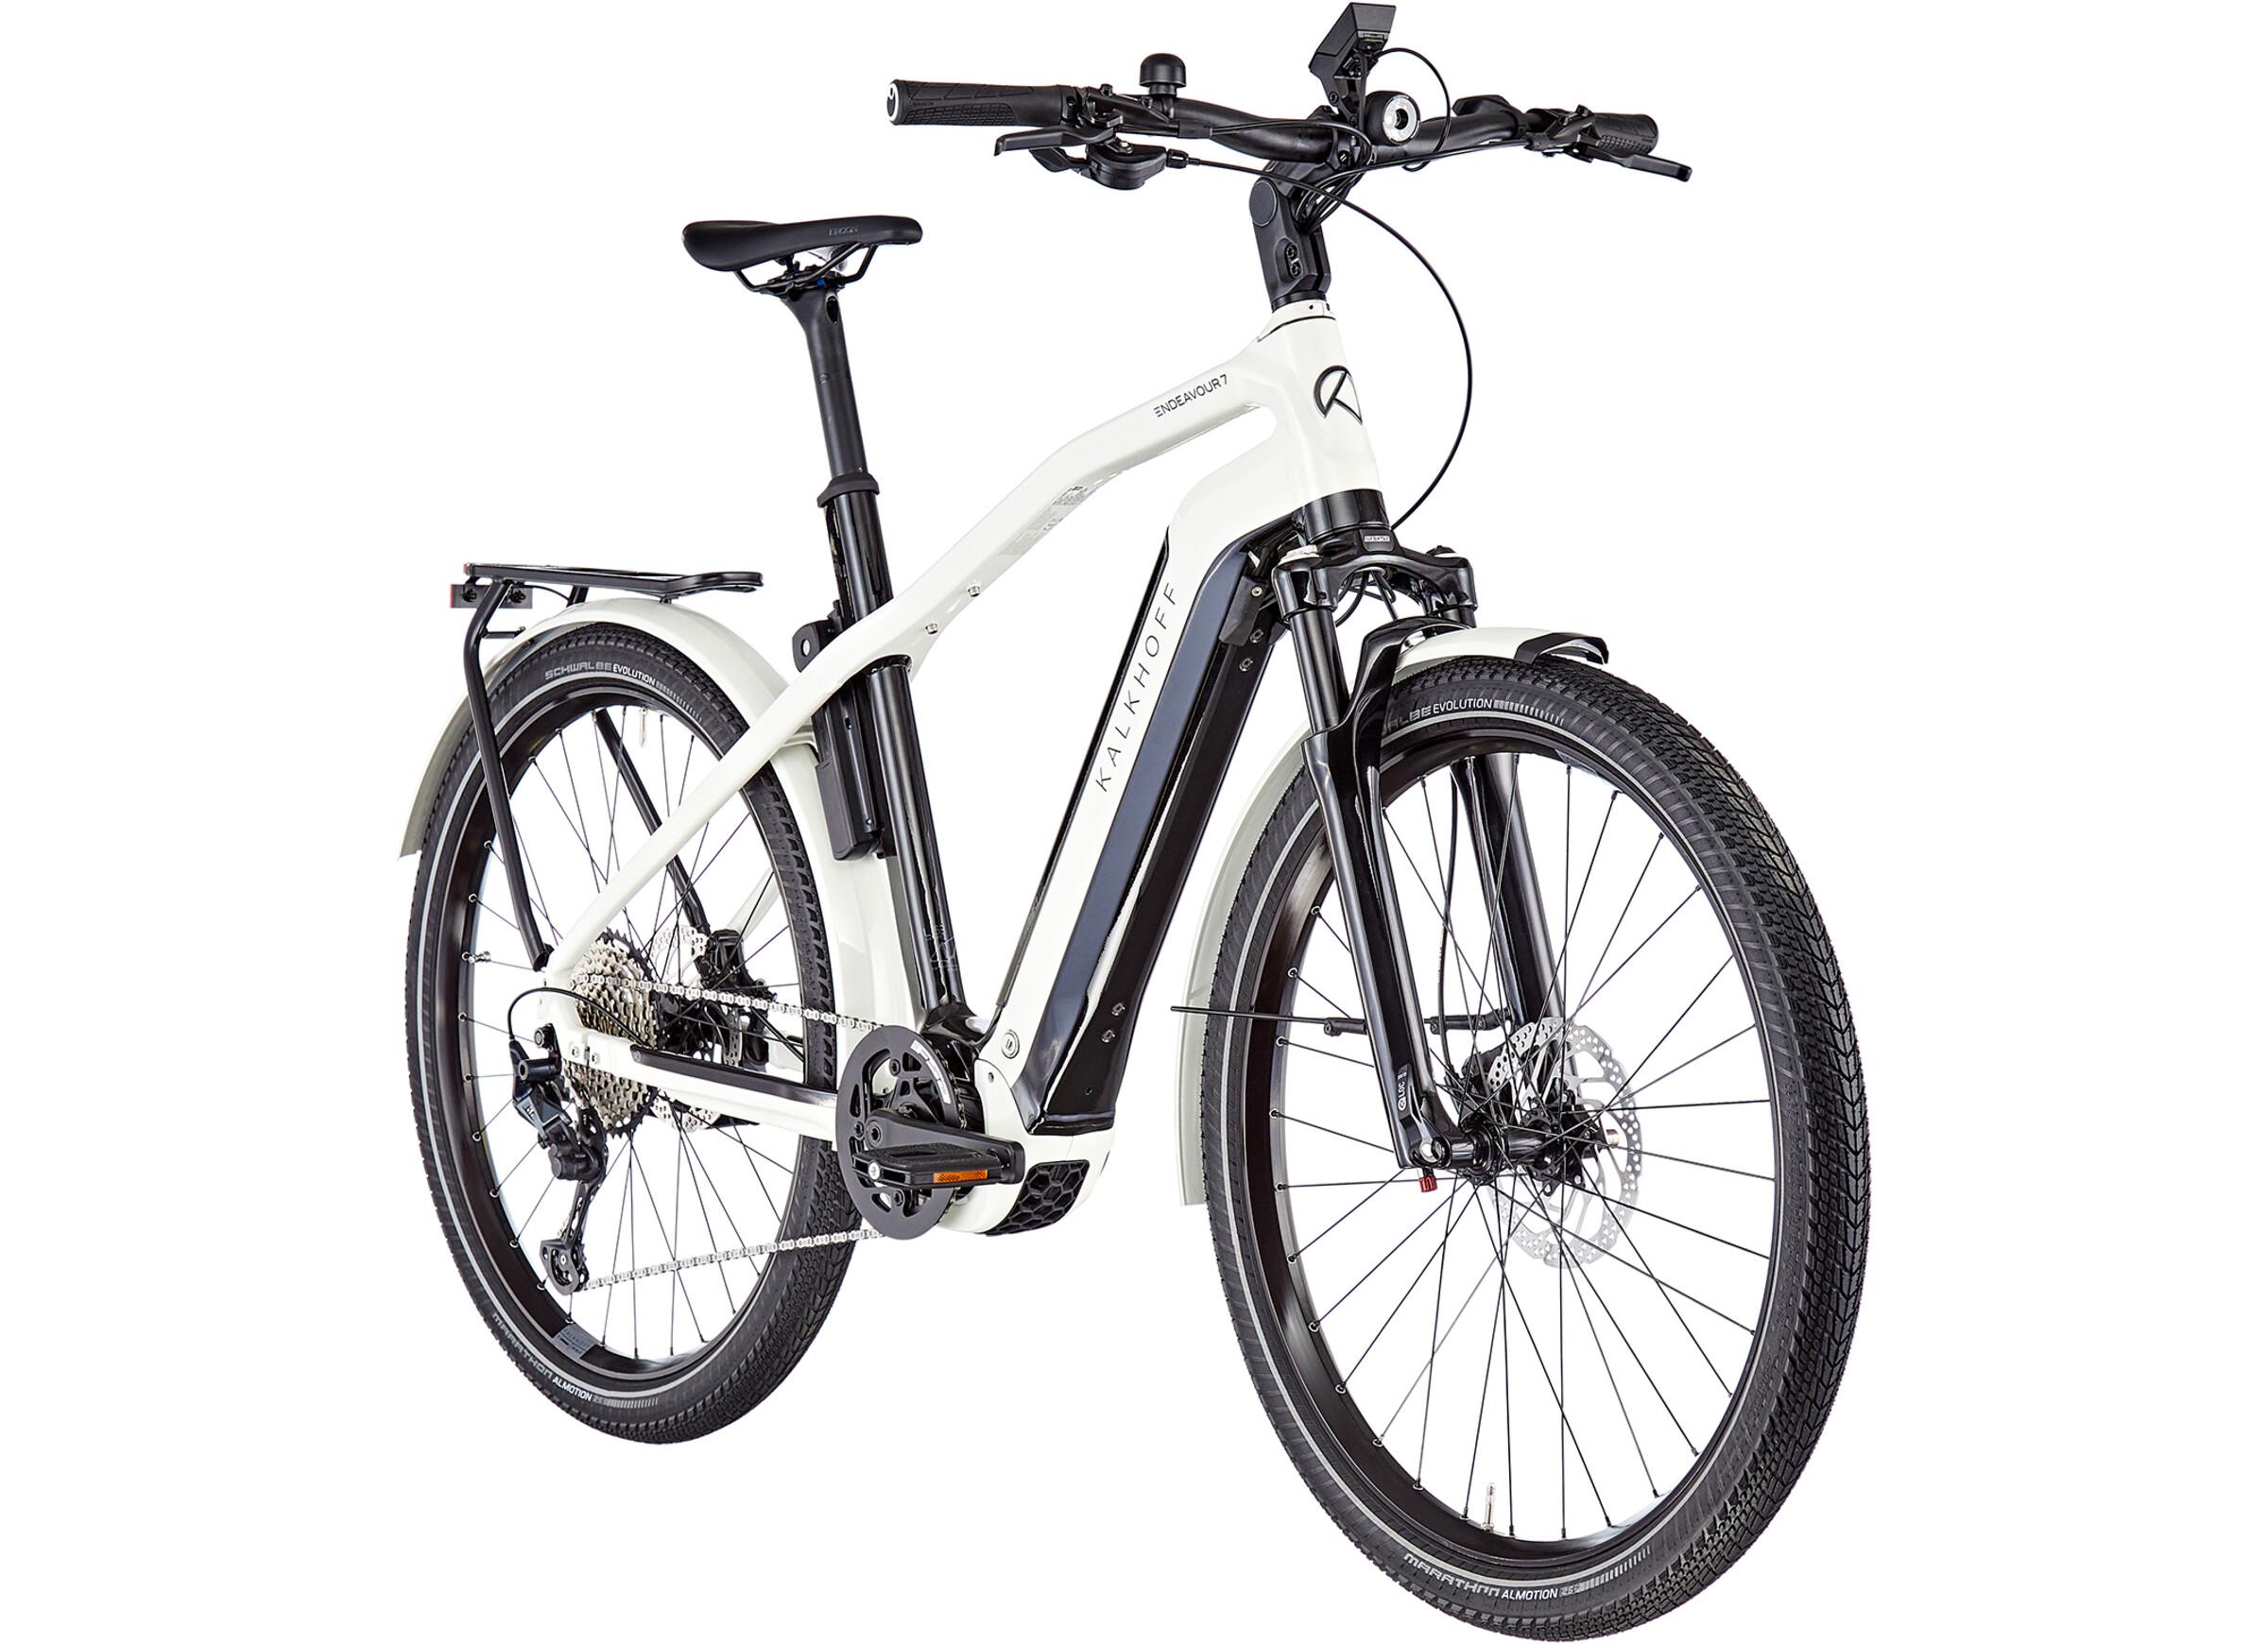 Kalkhoff Endeavour 7.B Advance Diamond Frame e-Bike